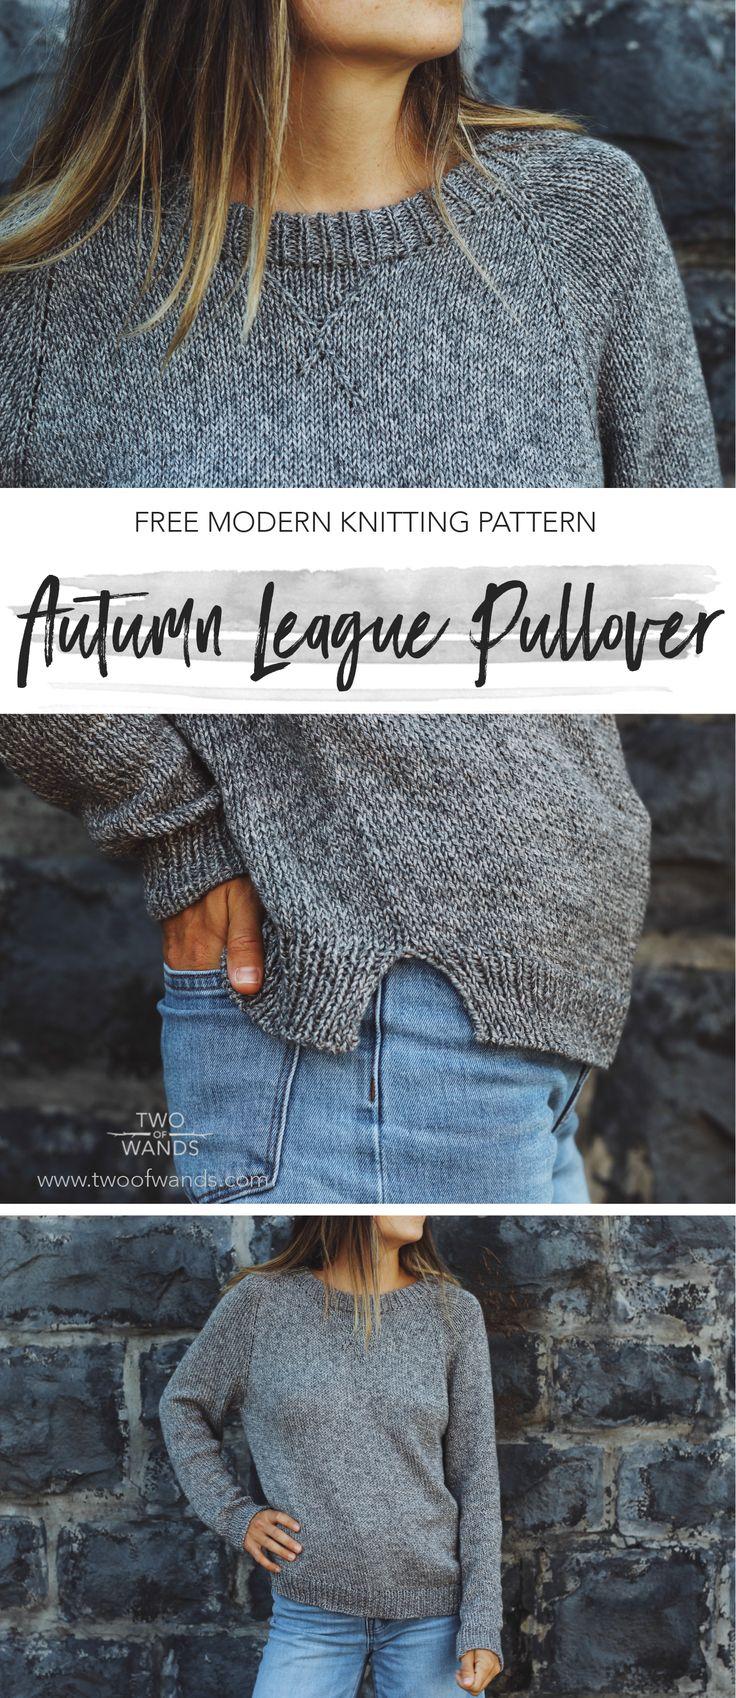 Autumn League Pullover – Mt Clarke